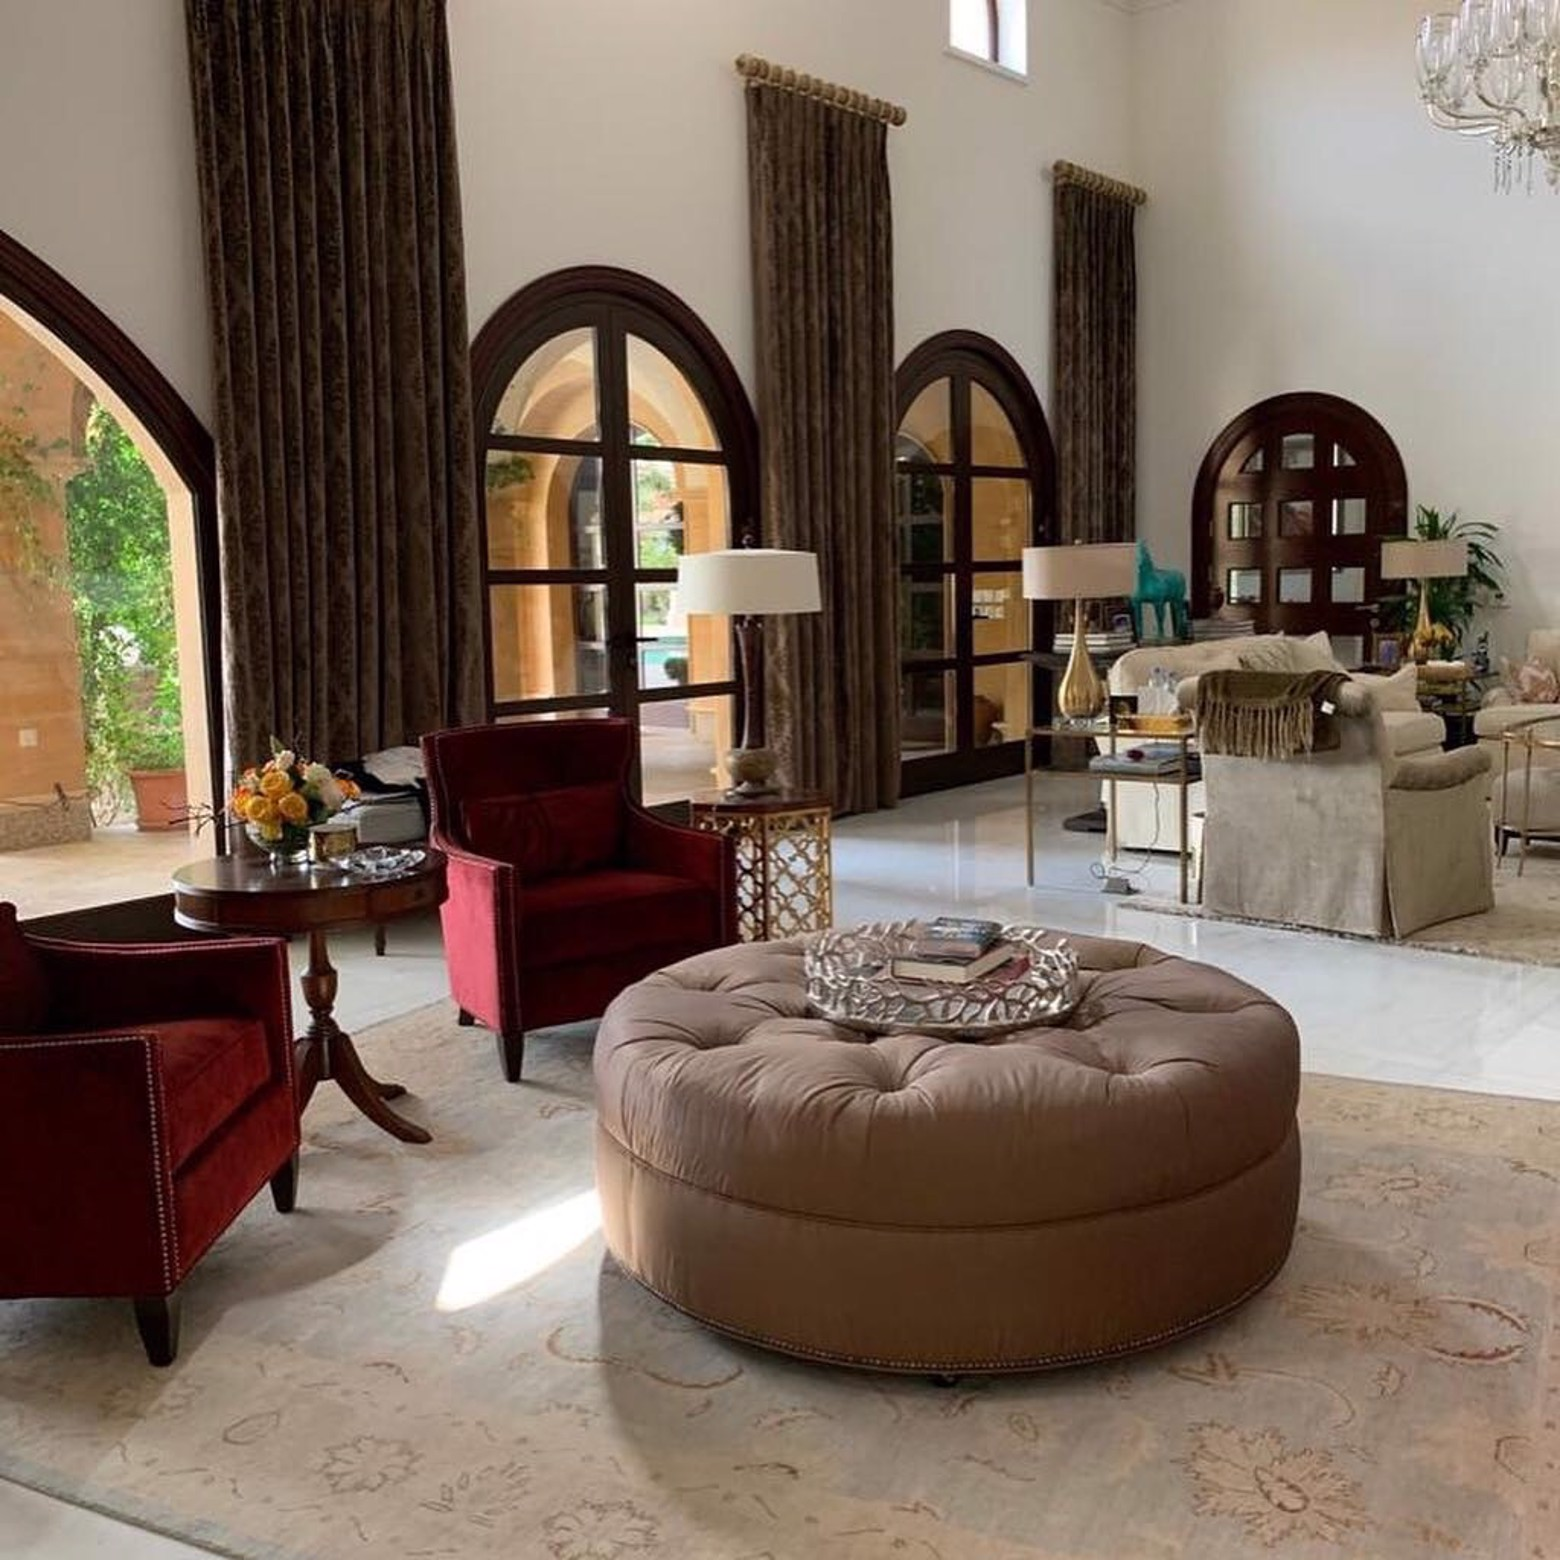 Luxury Saudi Arabia Home image